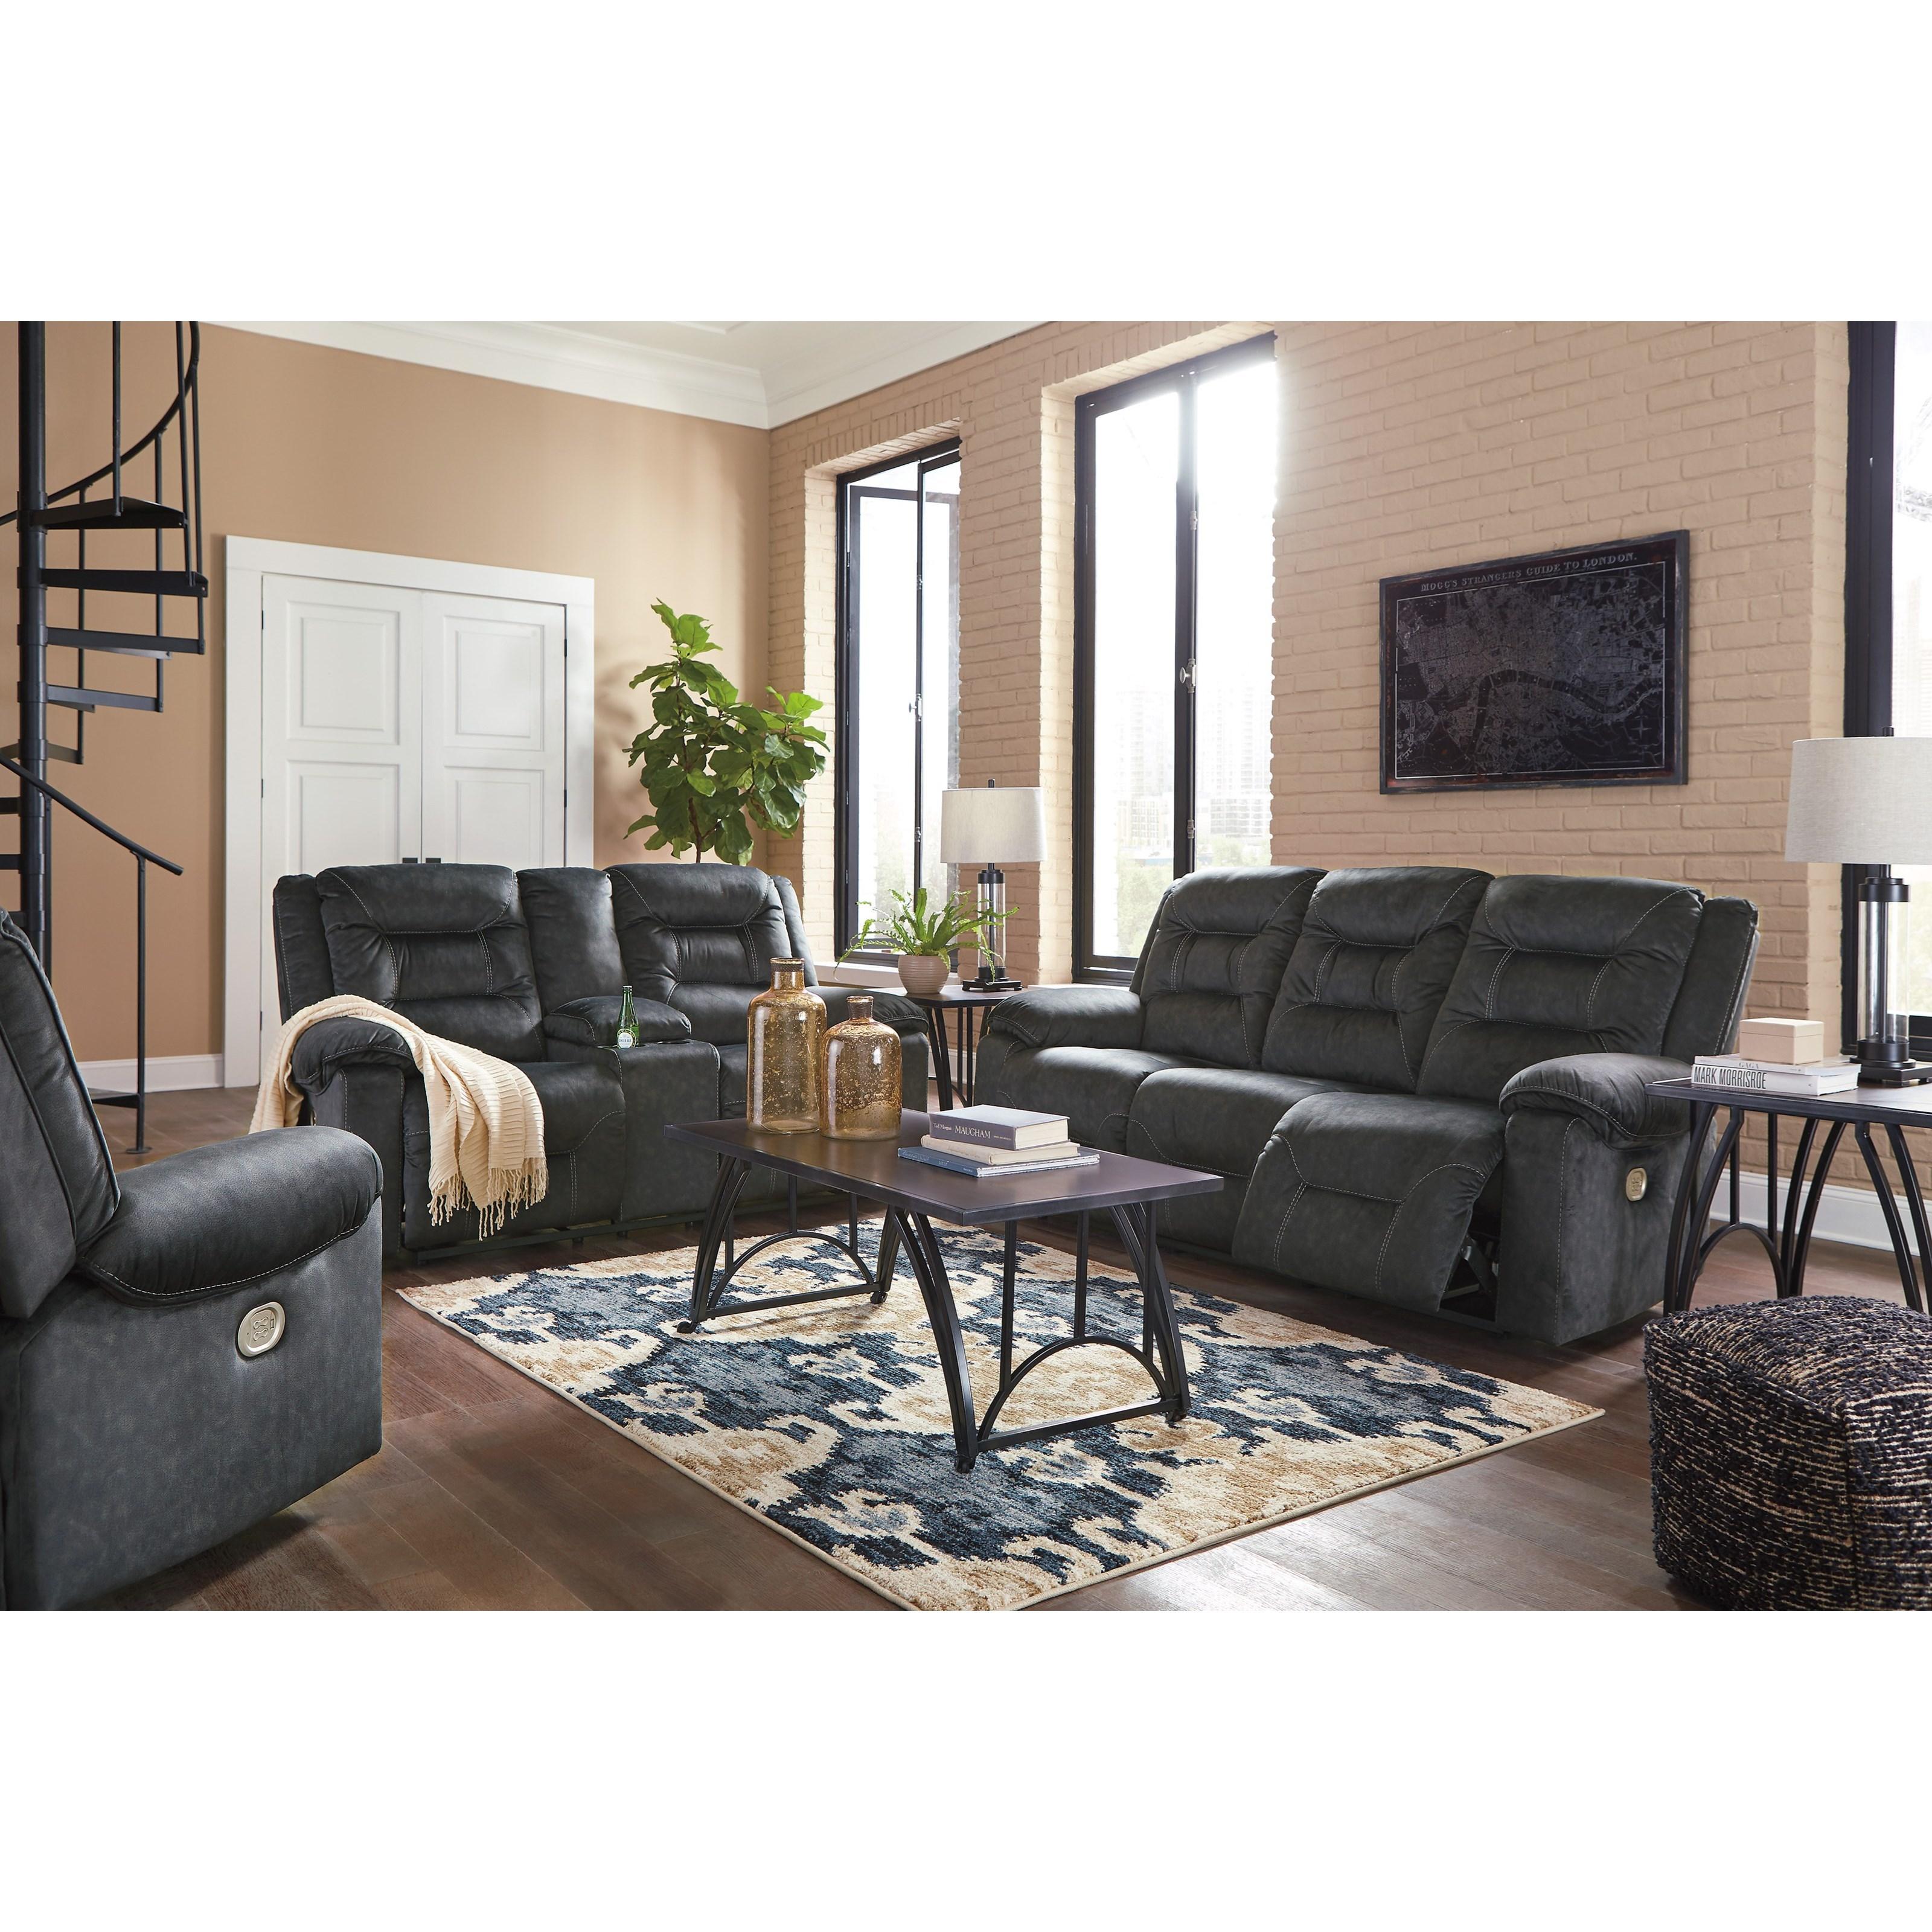 ... Design By Ashley Waldheim Reclining Living Room Group. Shown In: Gray  Waldheim Gray